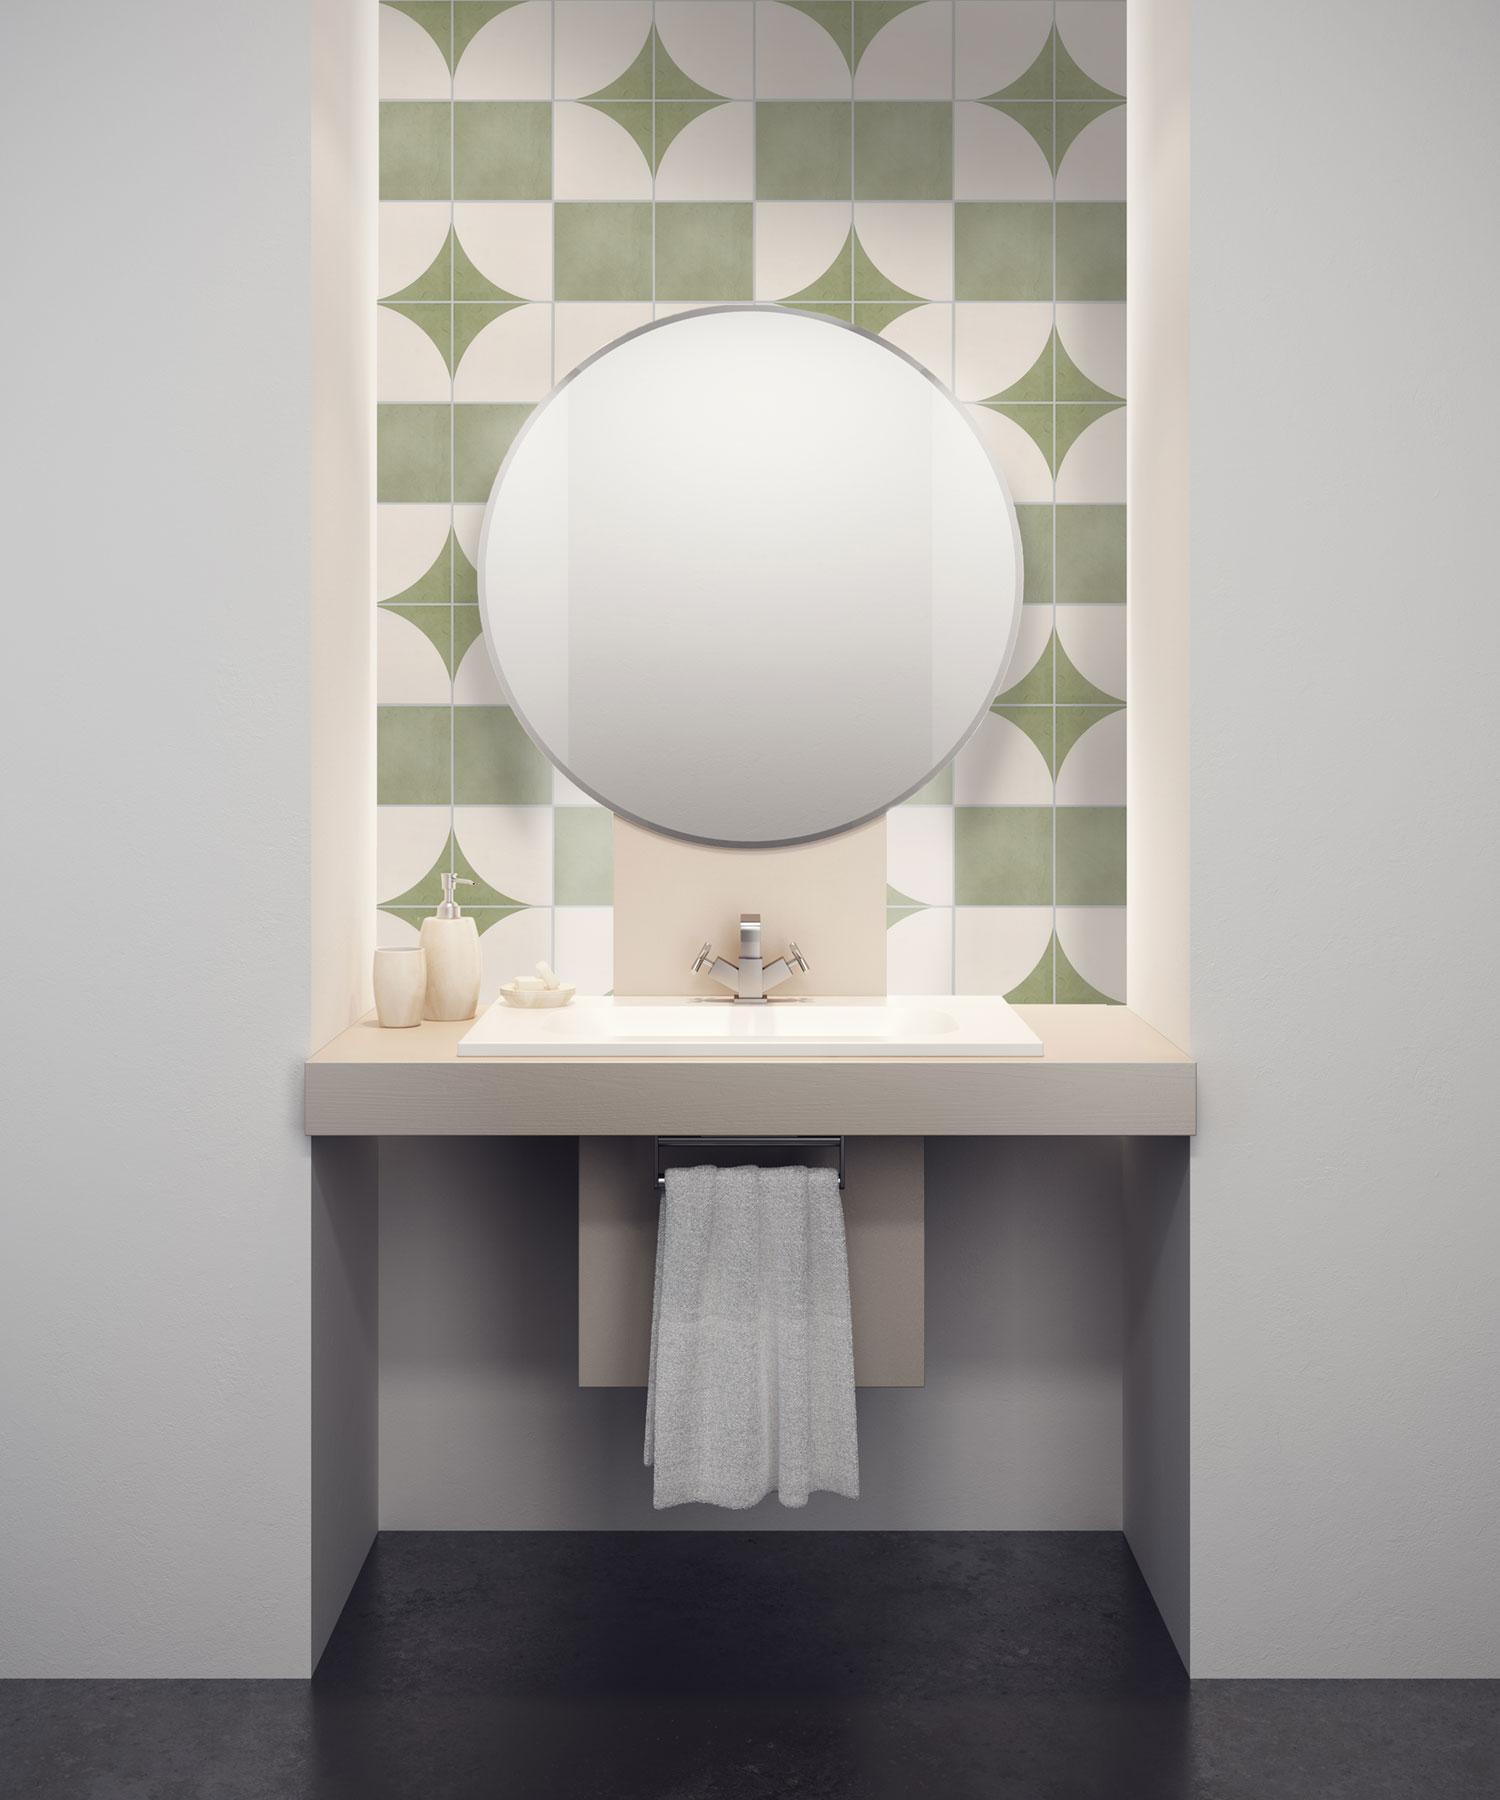 Rella Verde Curved Deco 150x150